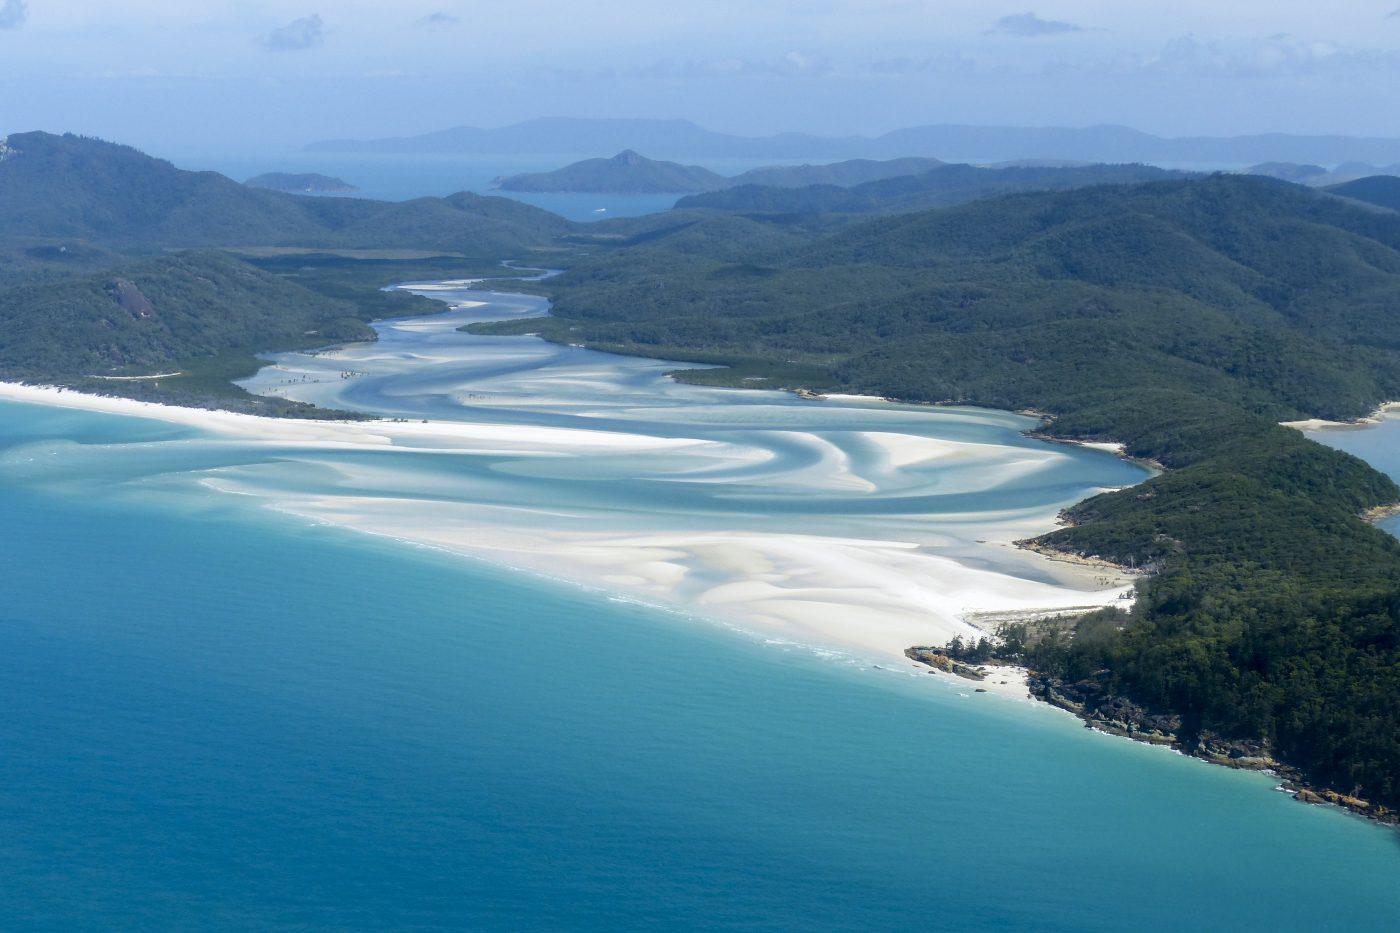 Visiting Australia's stunning Whitsunday islands